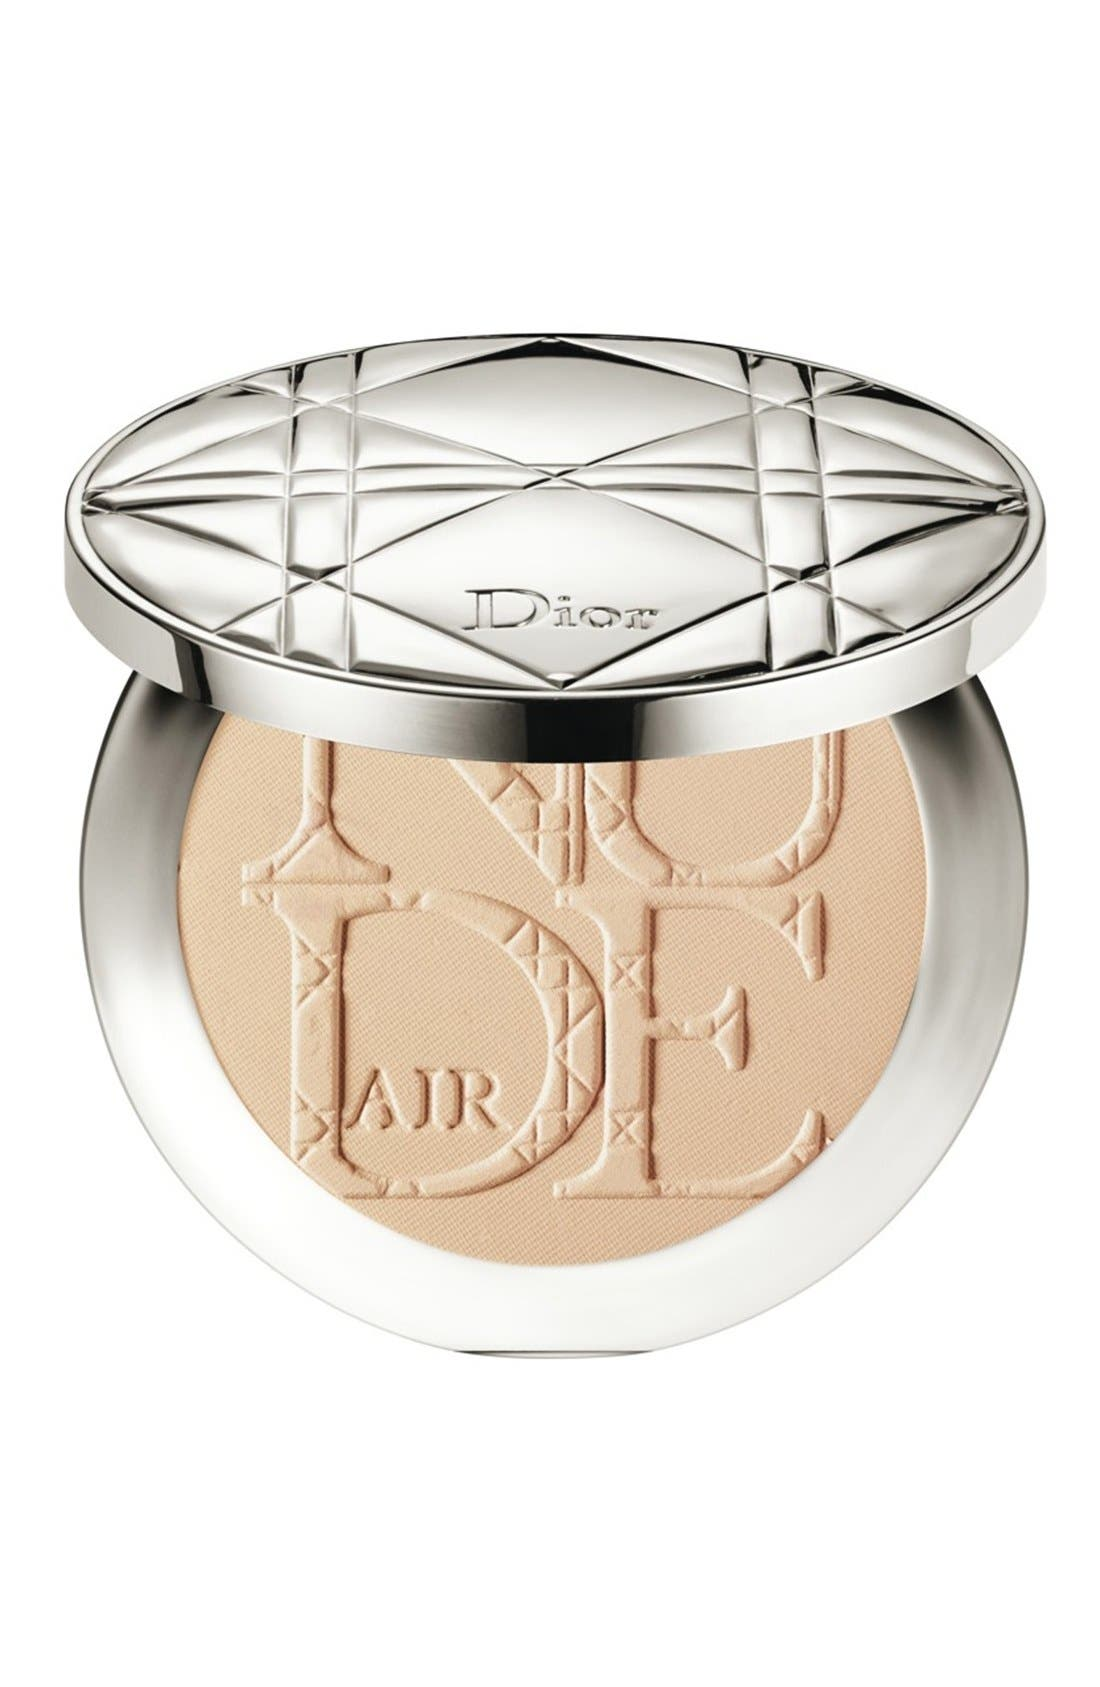 Dior Diorskin Nude Air Healthy Glow Invisible Powder - 020 Light Beige